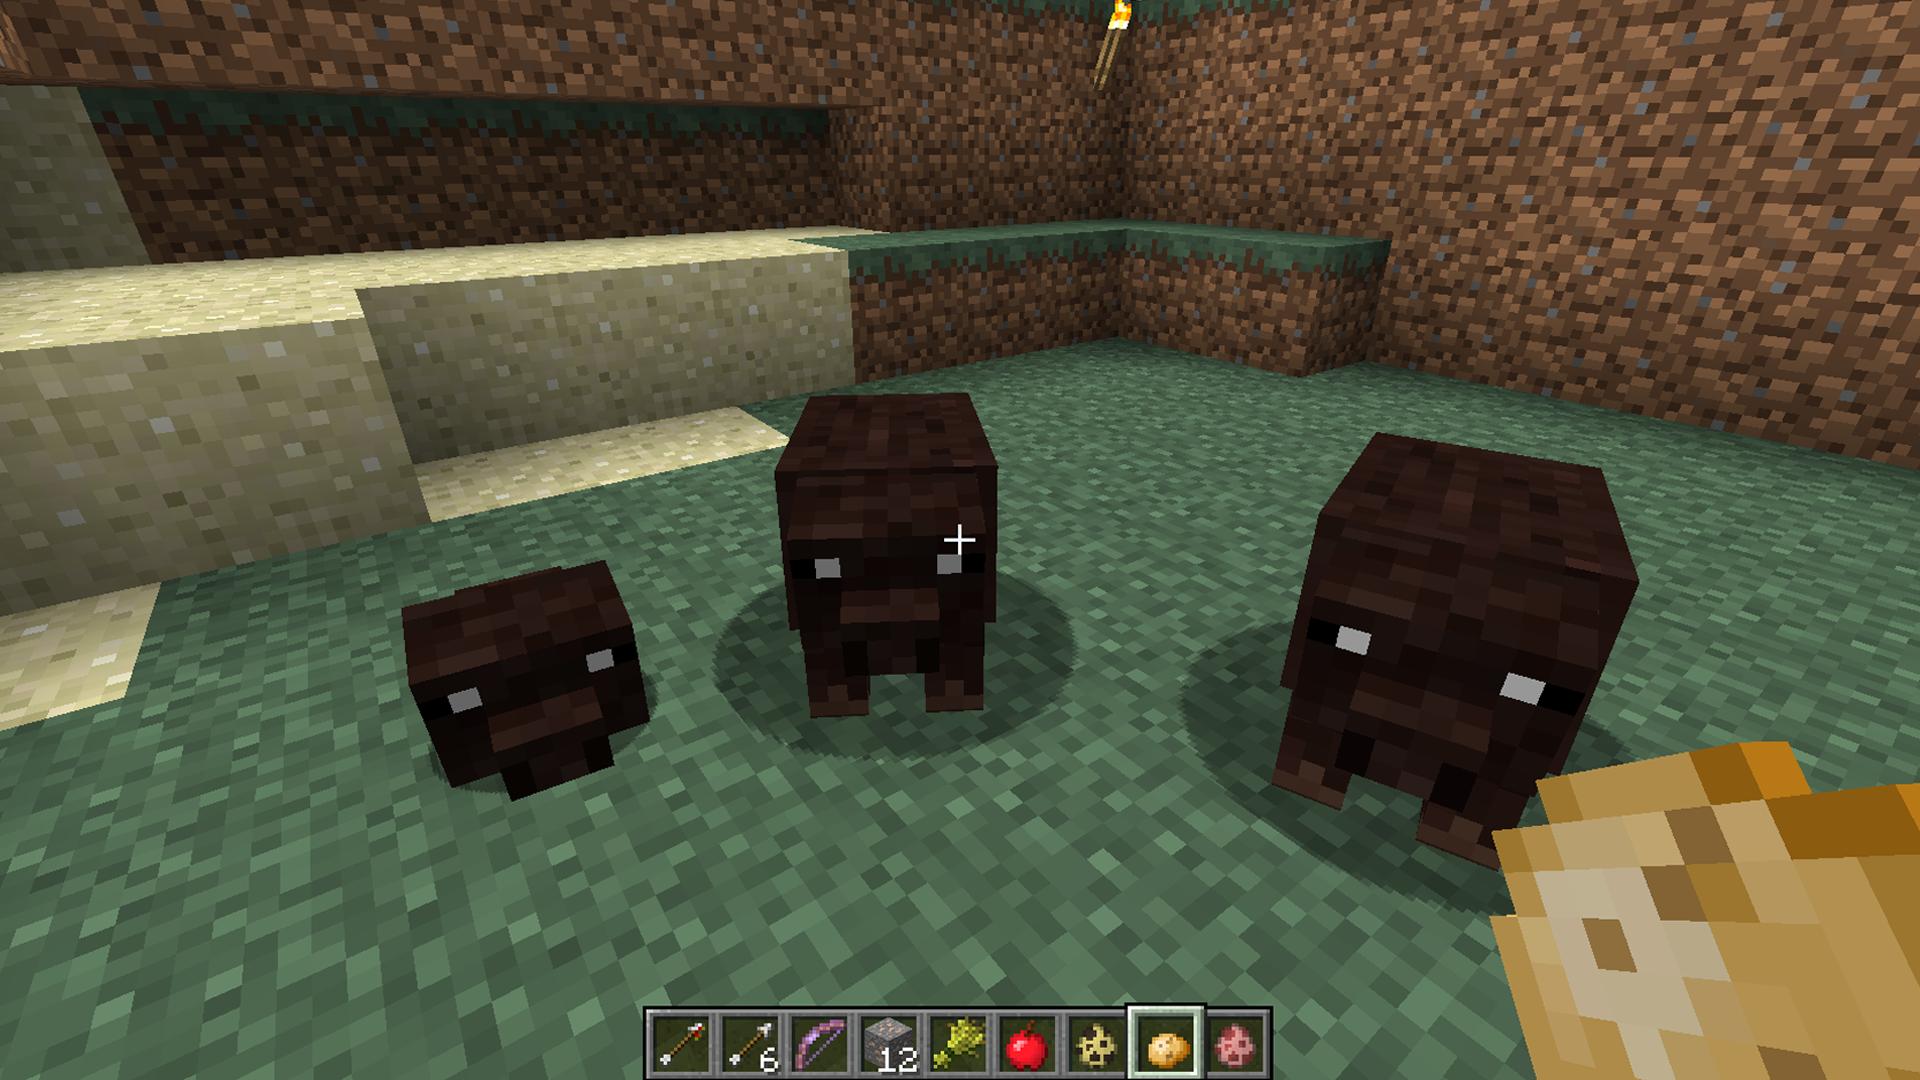 minecraft how to add mods